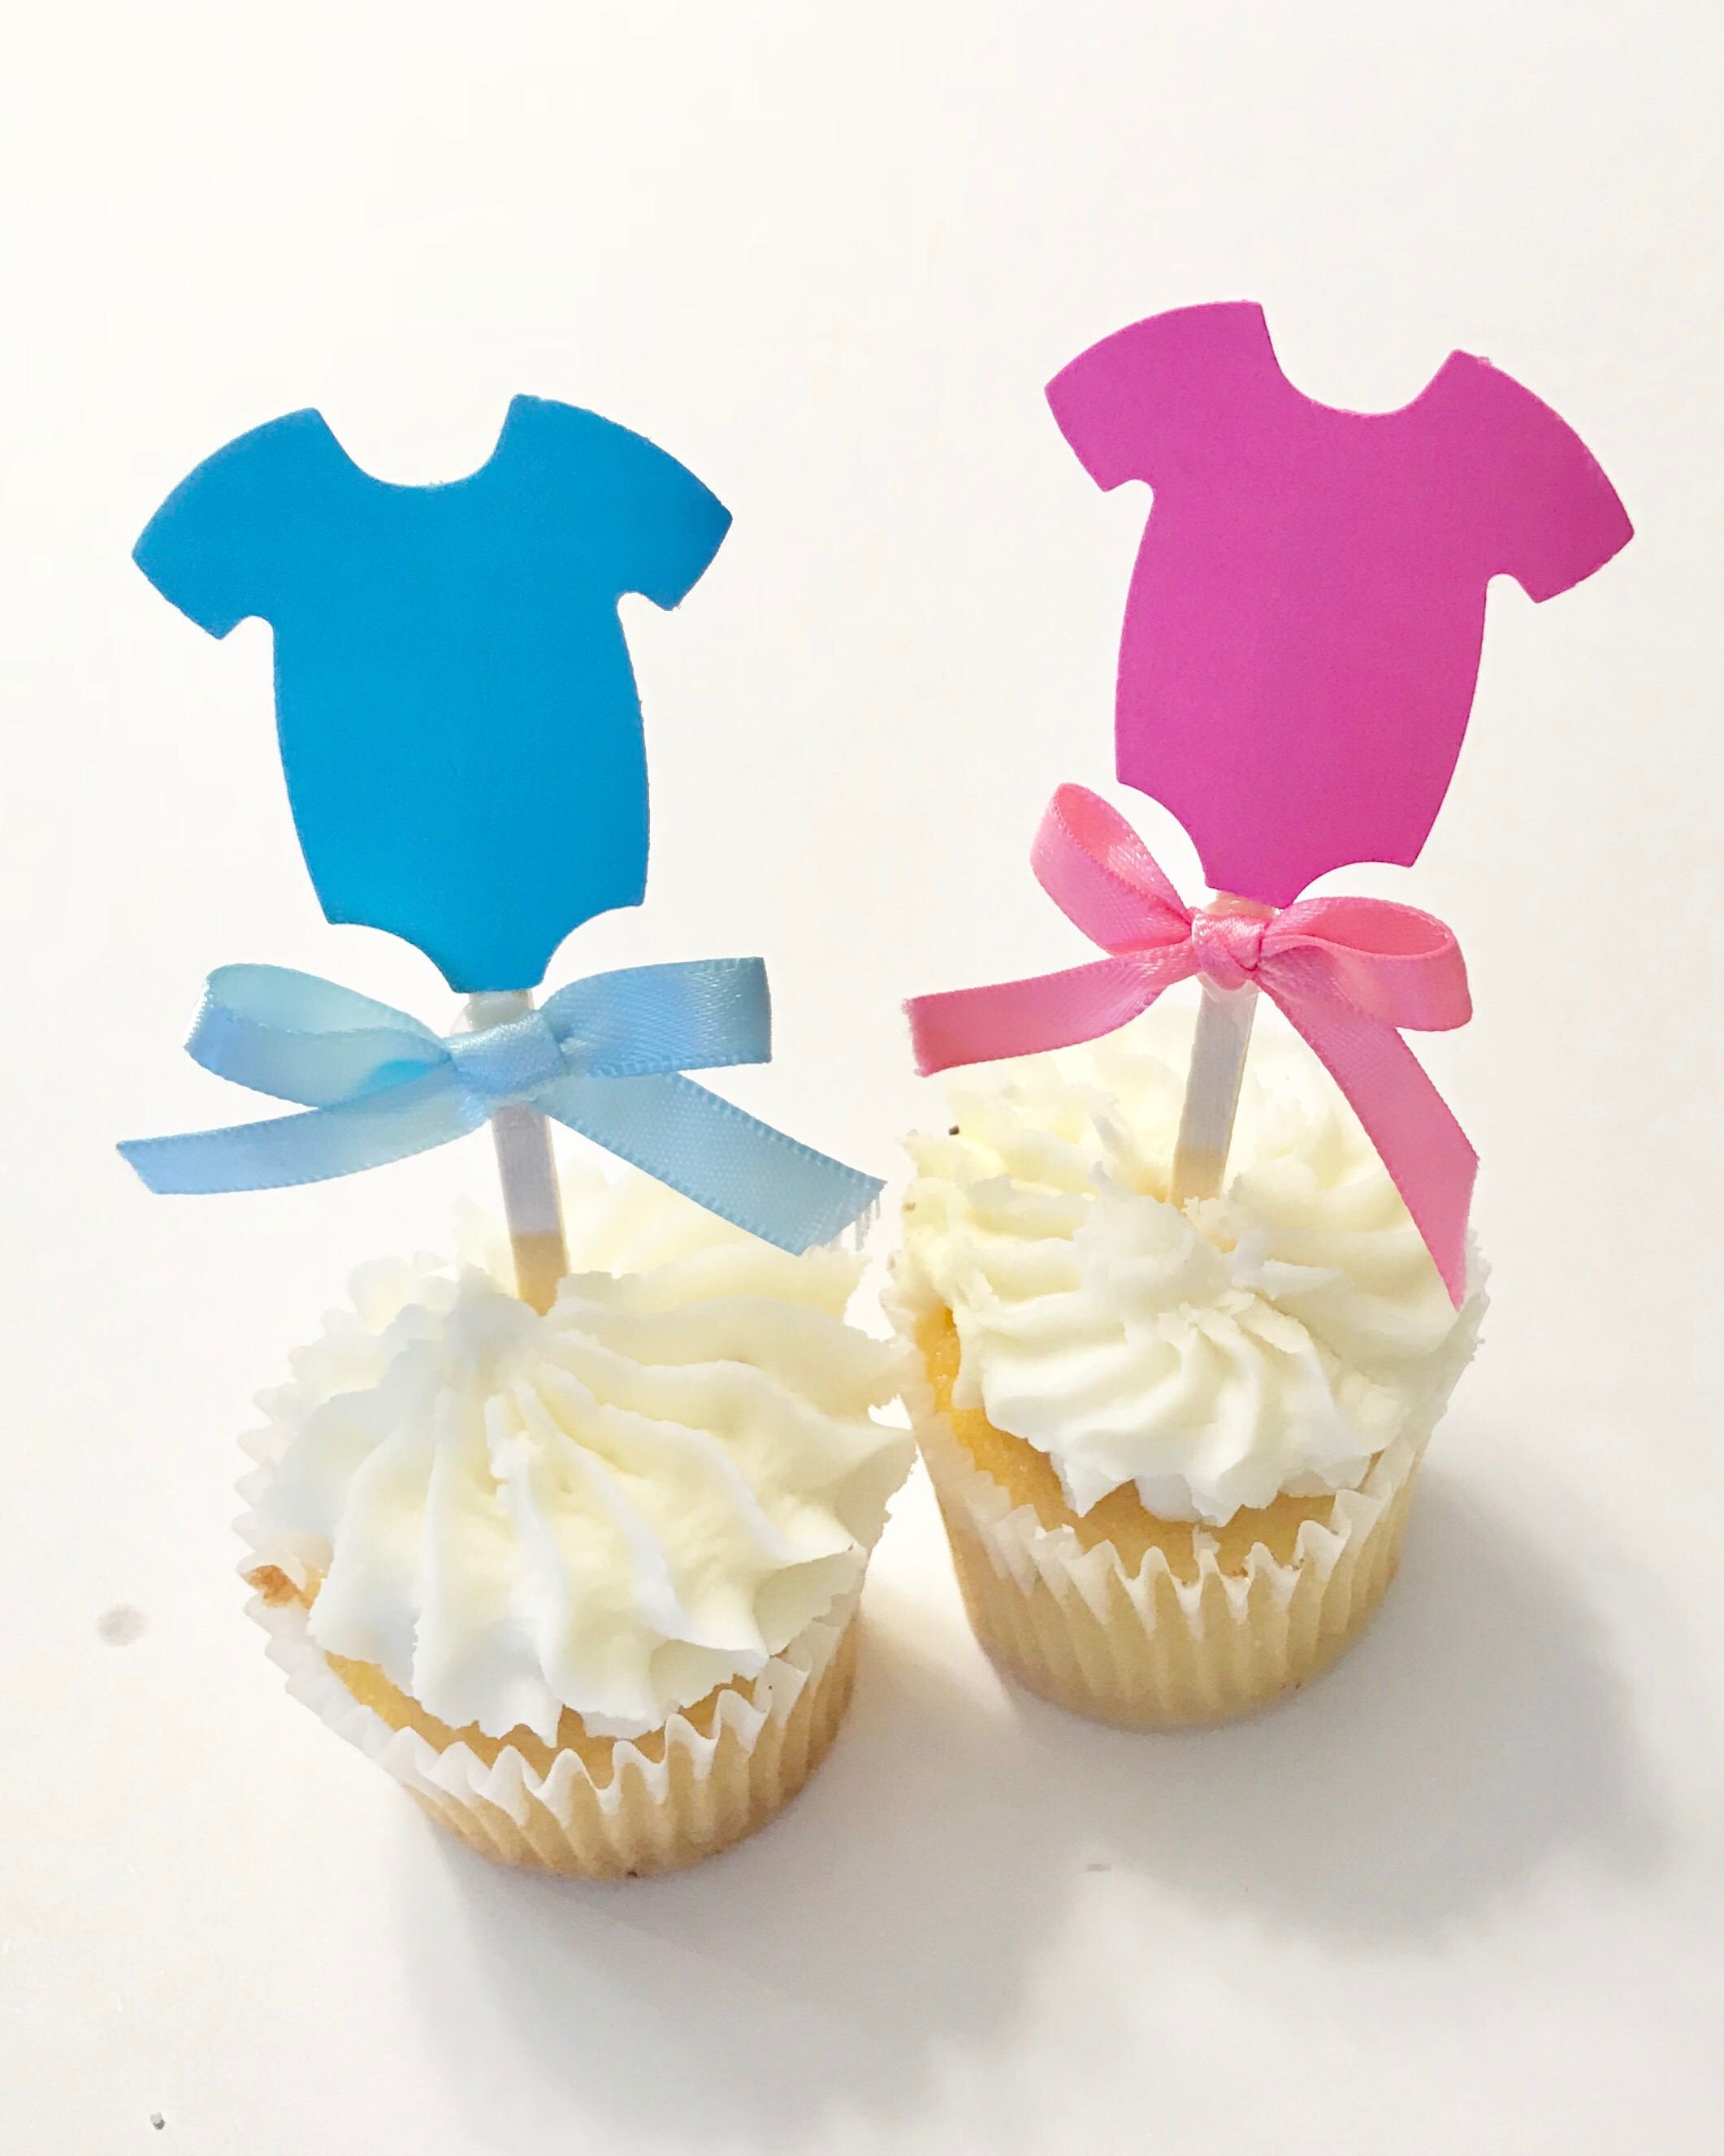 Gender Reveal Cupcake Toppers Gender Reveal Decorations Onesie Cupcake Topper With A Bow Cha Revelacao Decoracao Bolos De Cha Lembrancinha Cha Revelacao